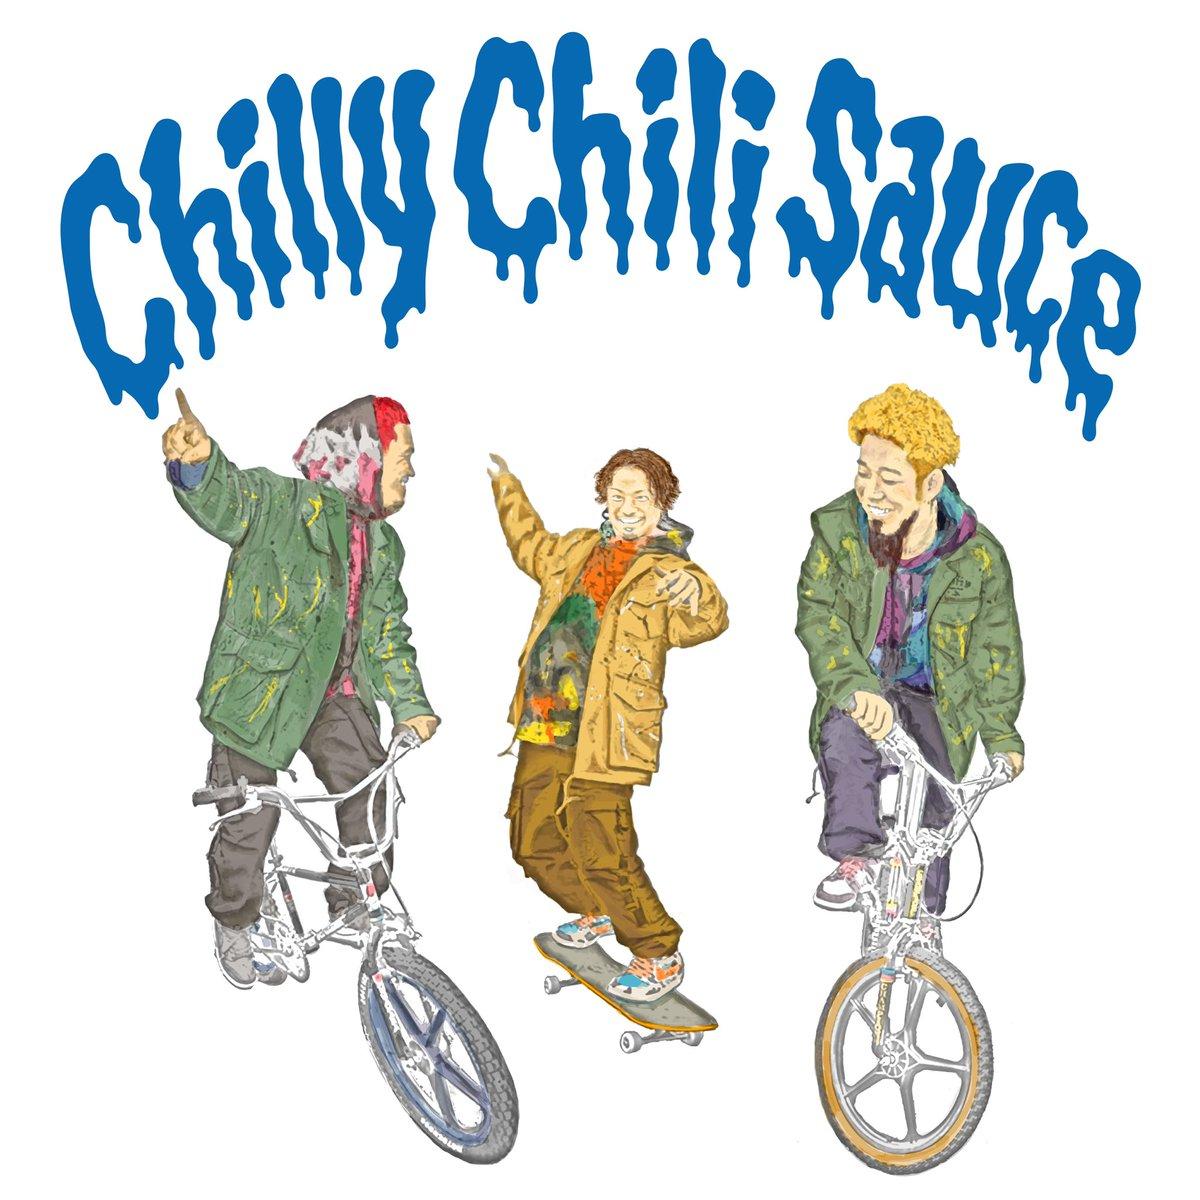 『WANIMA - Chilly Chili Sauce』収録の『Chilly Chili Sauce』ジャケット